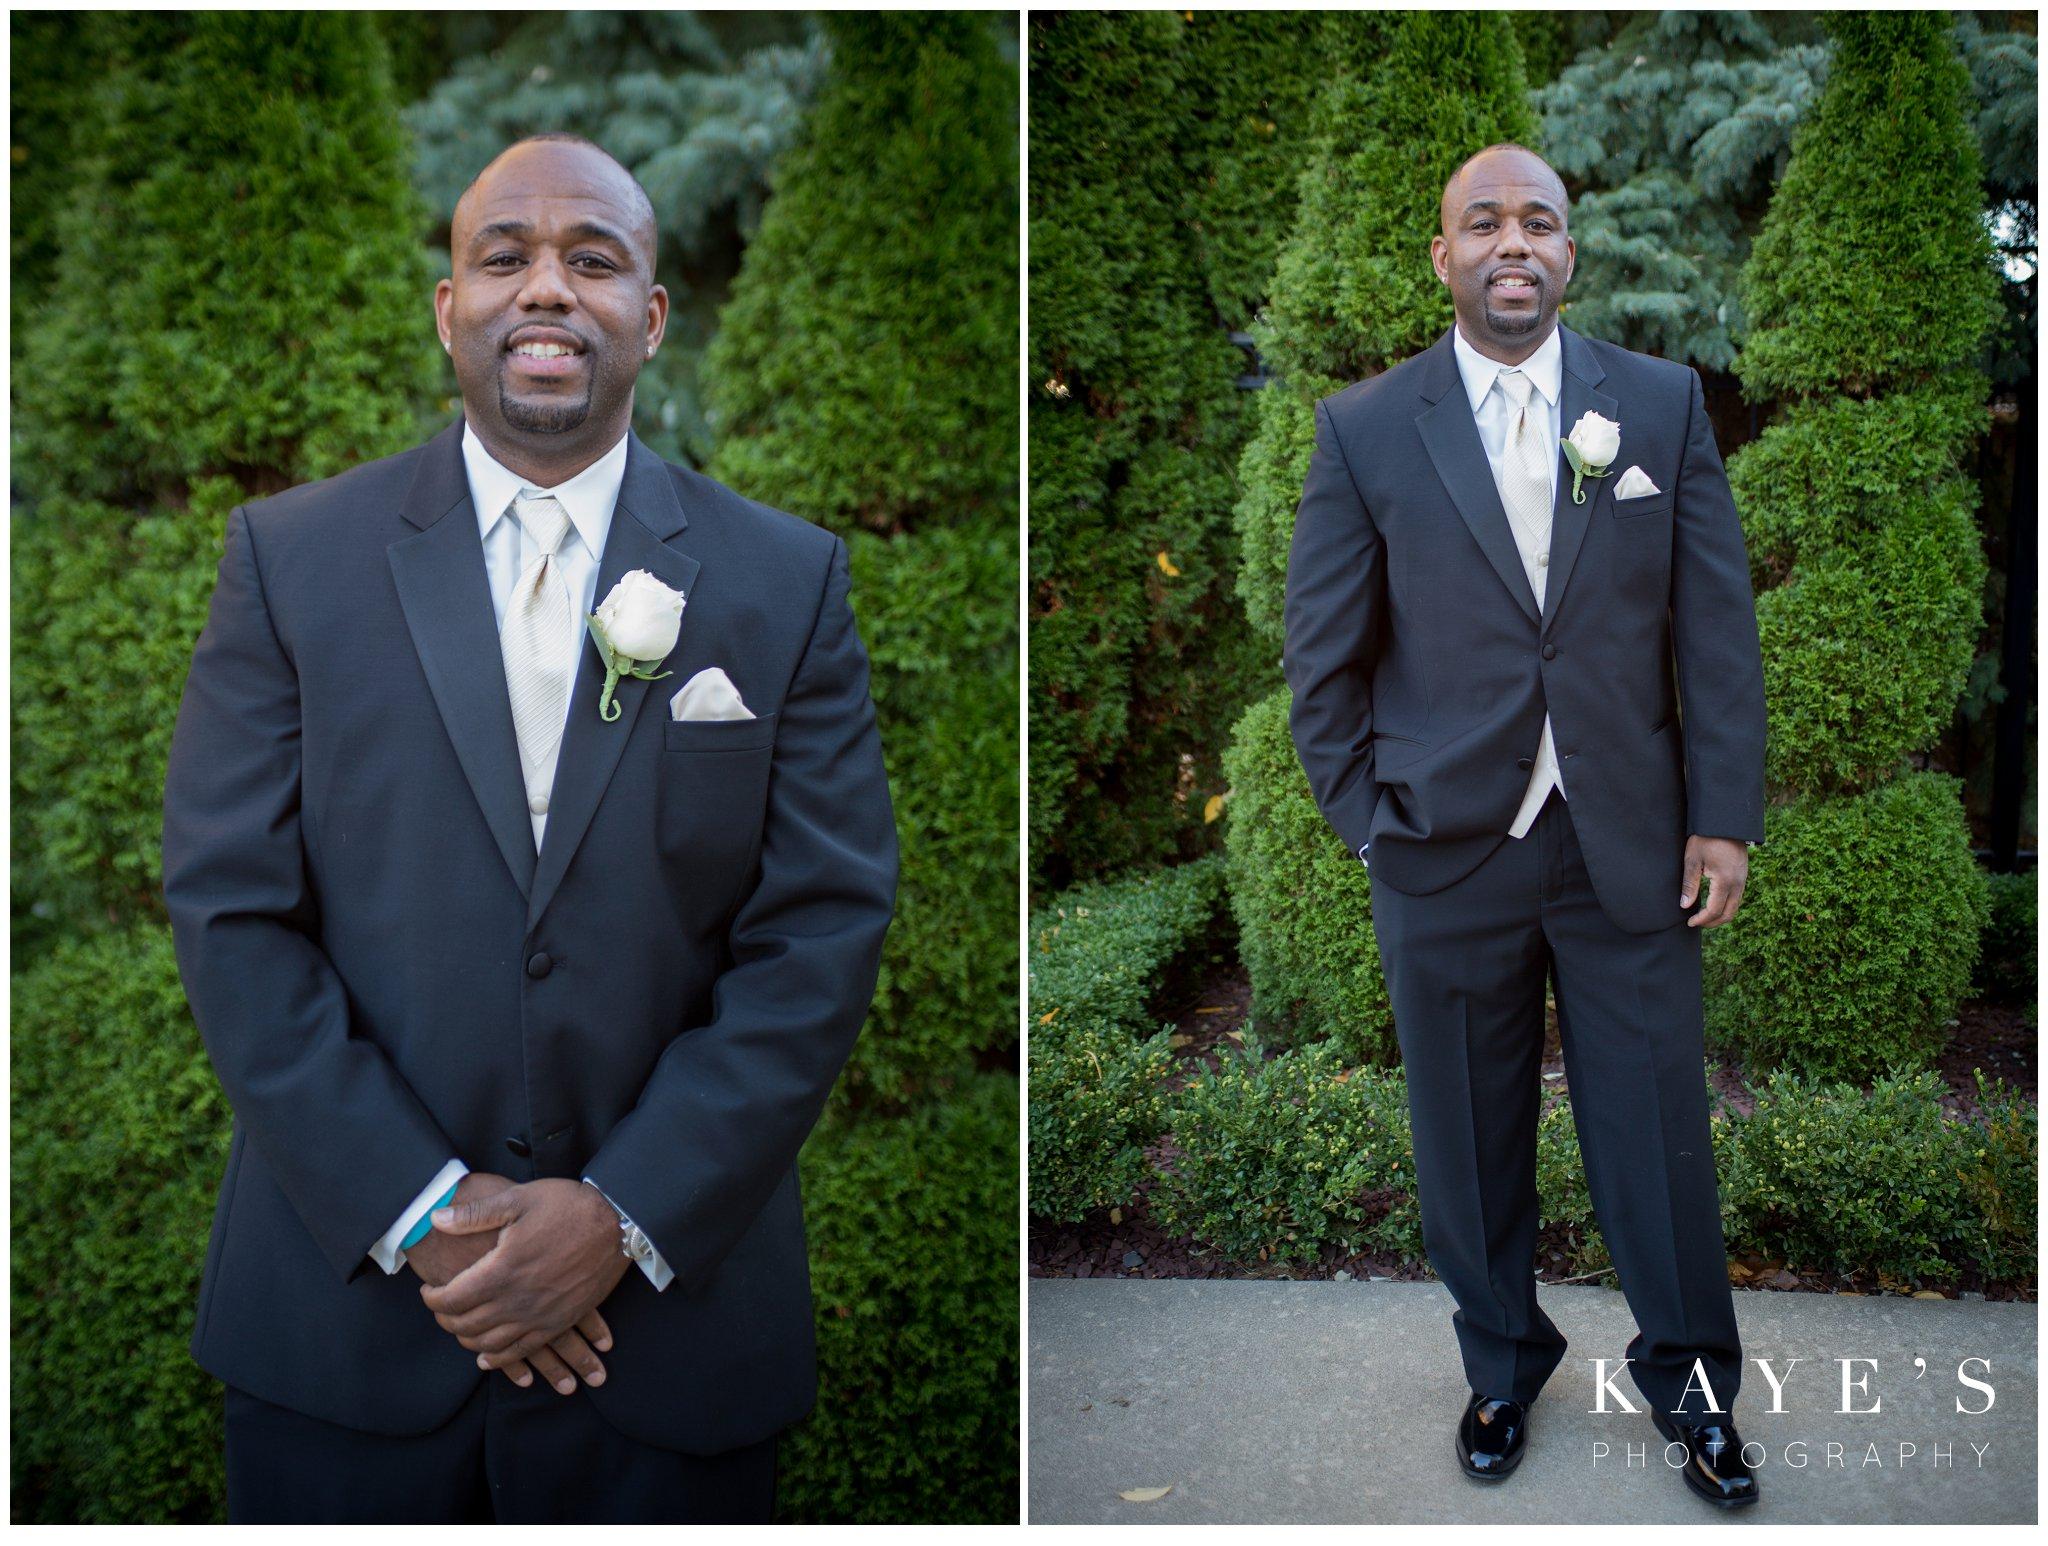 Kayes Photography- howell-michigan-wedding-photographer_0639.jpg